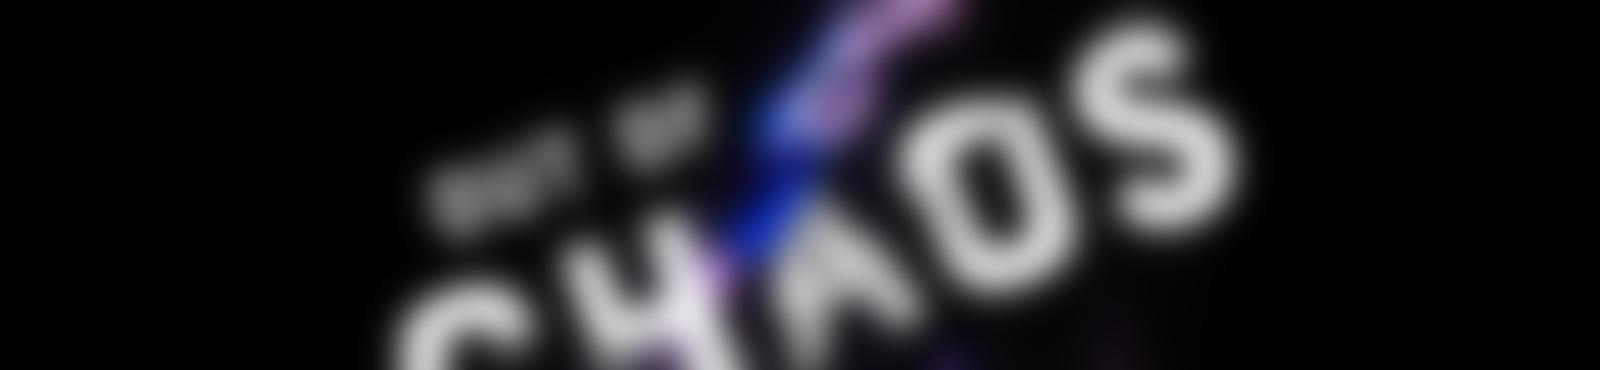 Blurred 1d7e74bd dcfd 4a6a bb3d 21031ce6c3fd